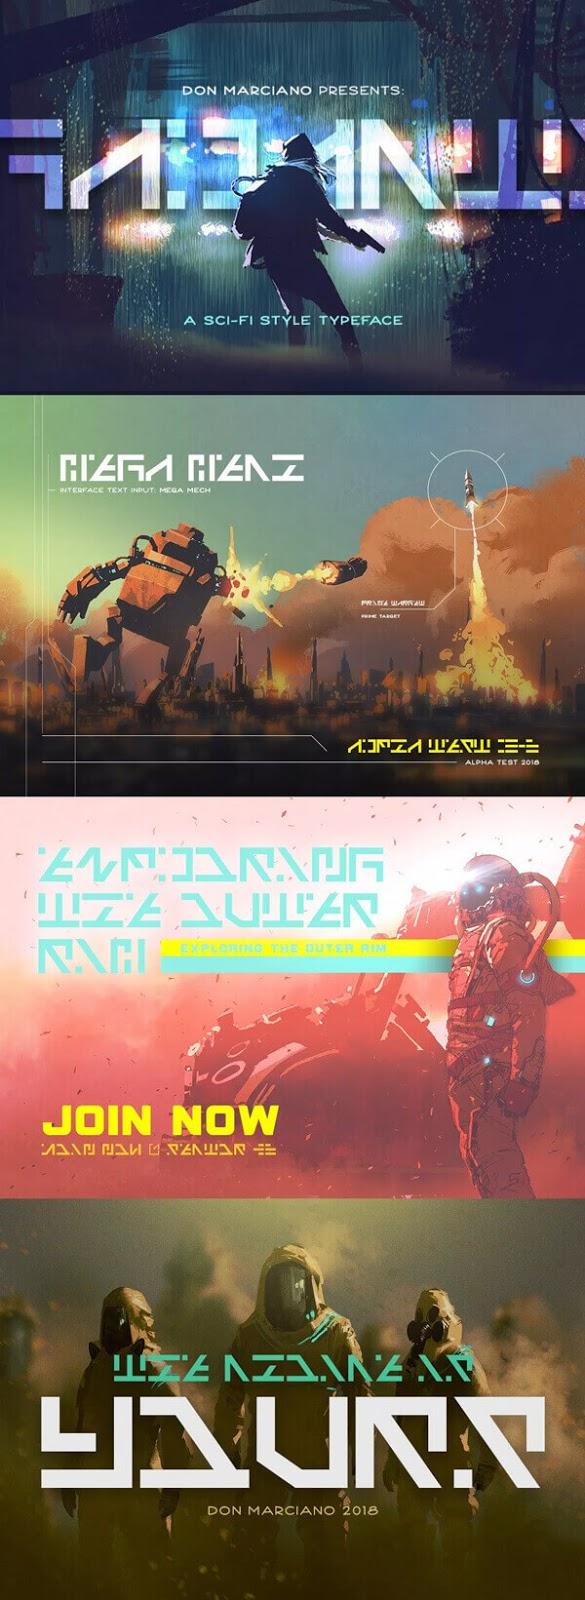 Free Font - Galactico Sci-fi Free Font